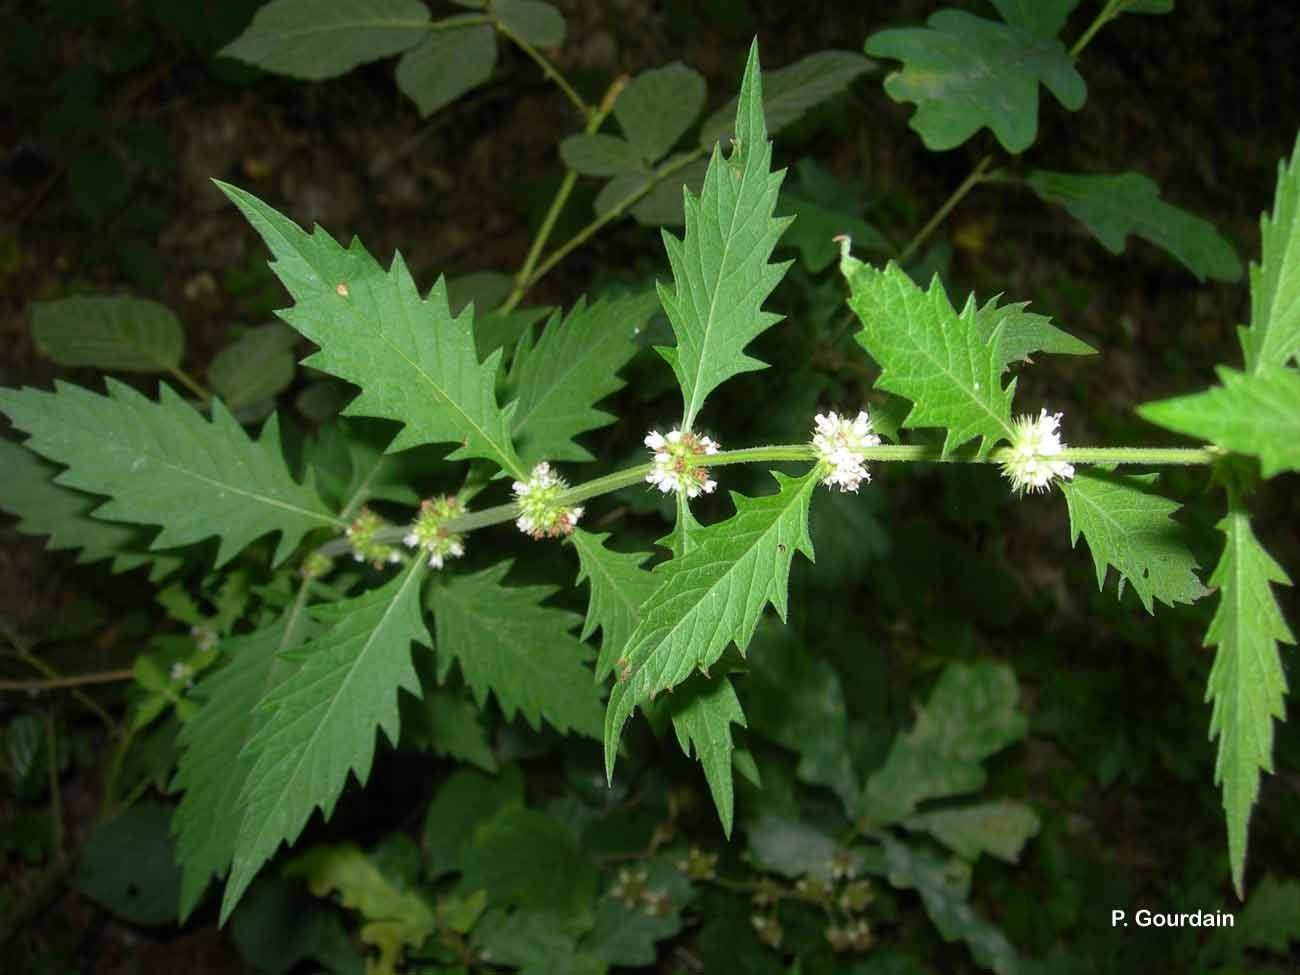 Image of European bugleweed